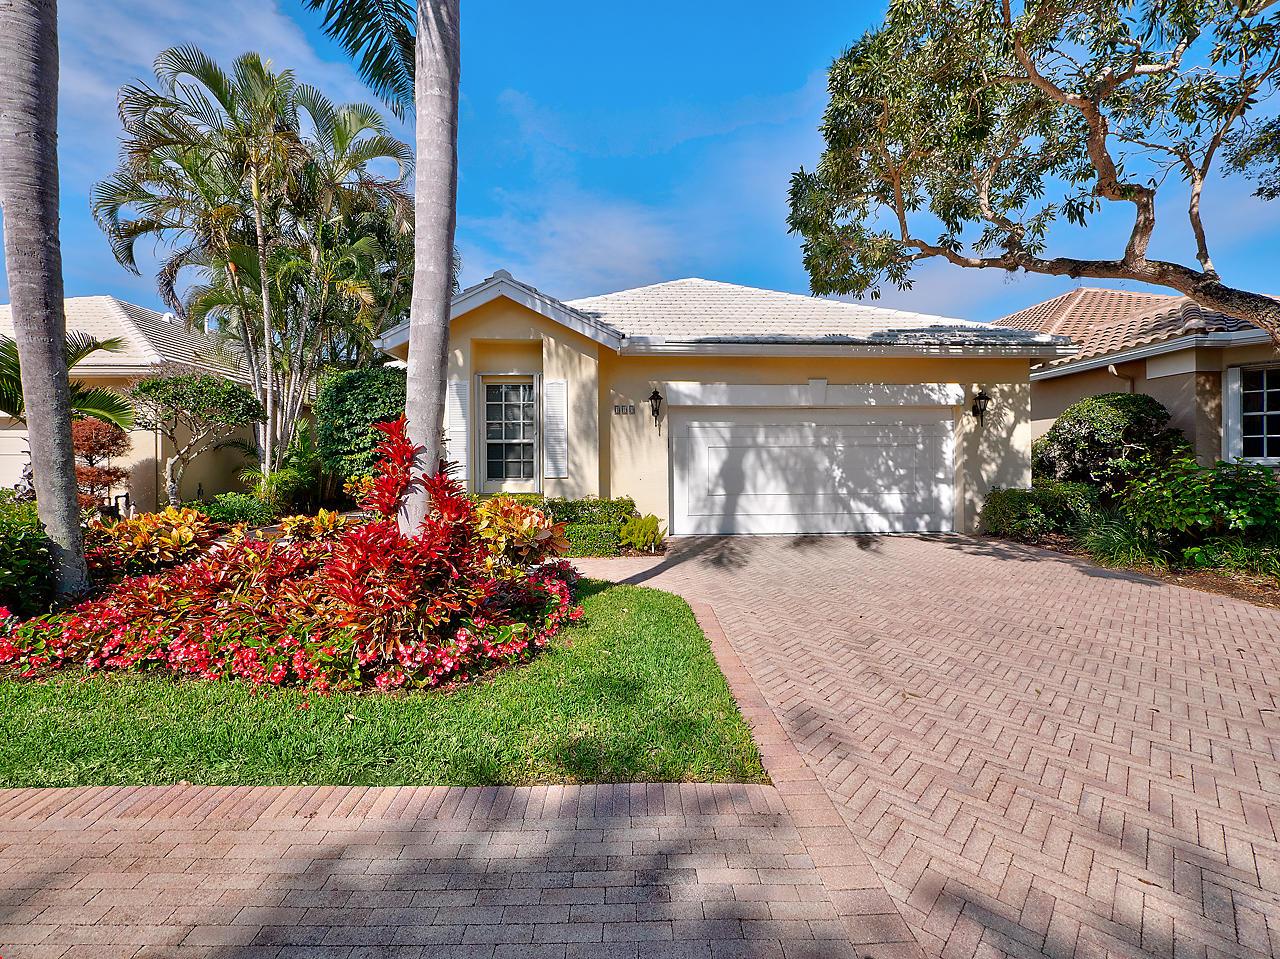 118 Victoria Bay Court, Palm Beach Gardens, Florida 33418, 3 Bedrooms Bedrooms, ,3 BathroomsBathrooms,A,Single family,Victoria Bay,RX-10496070